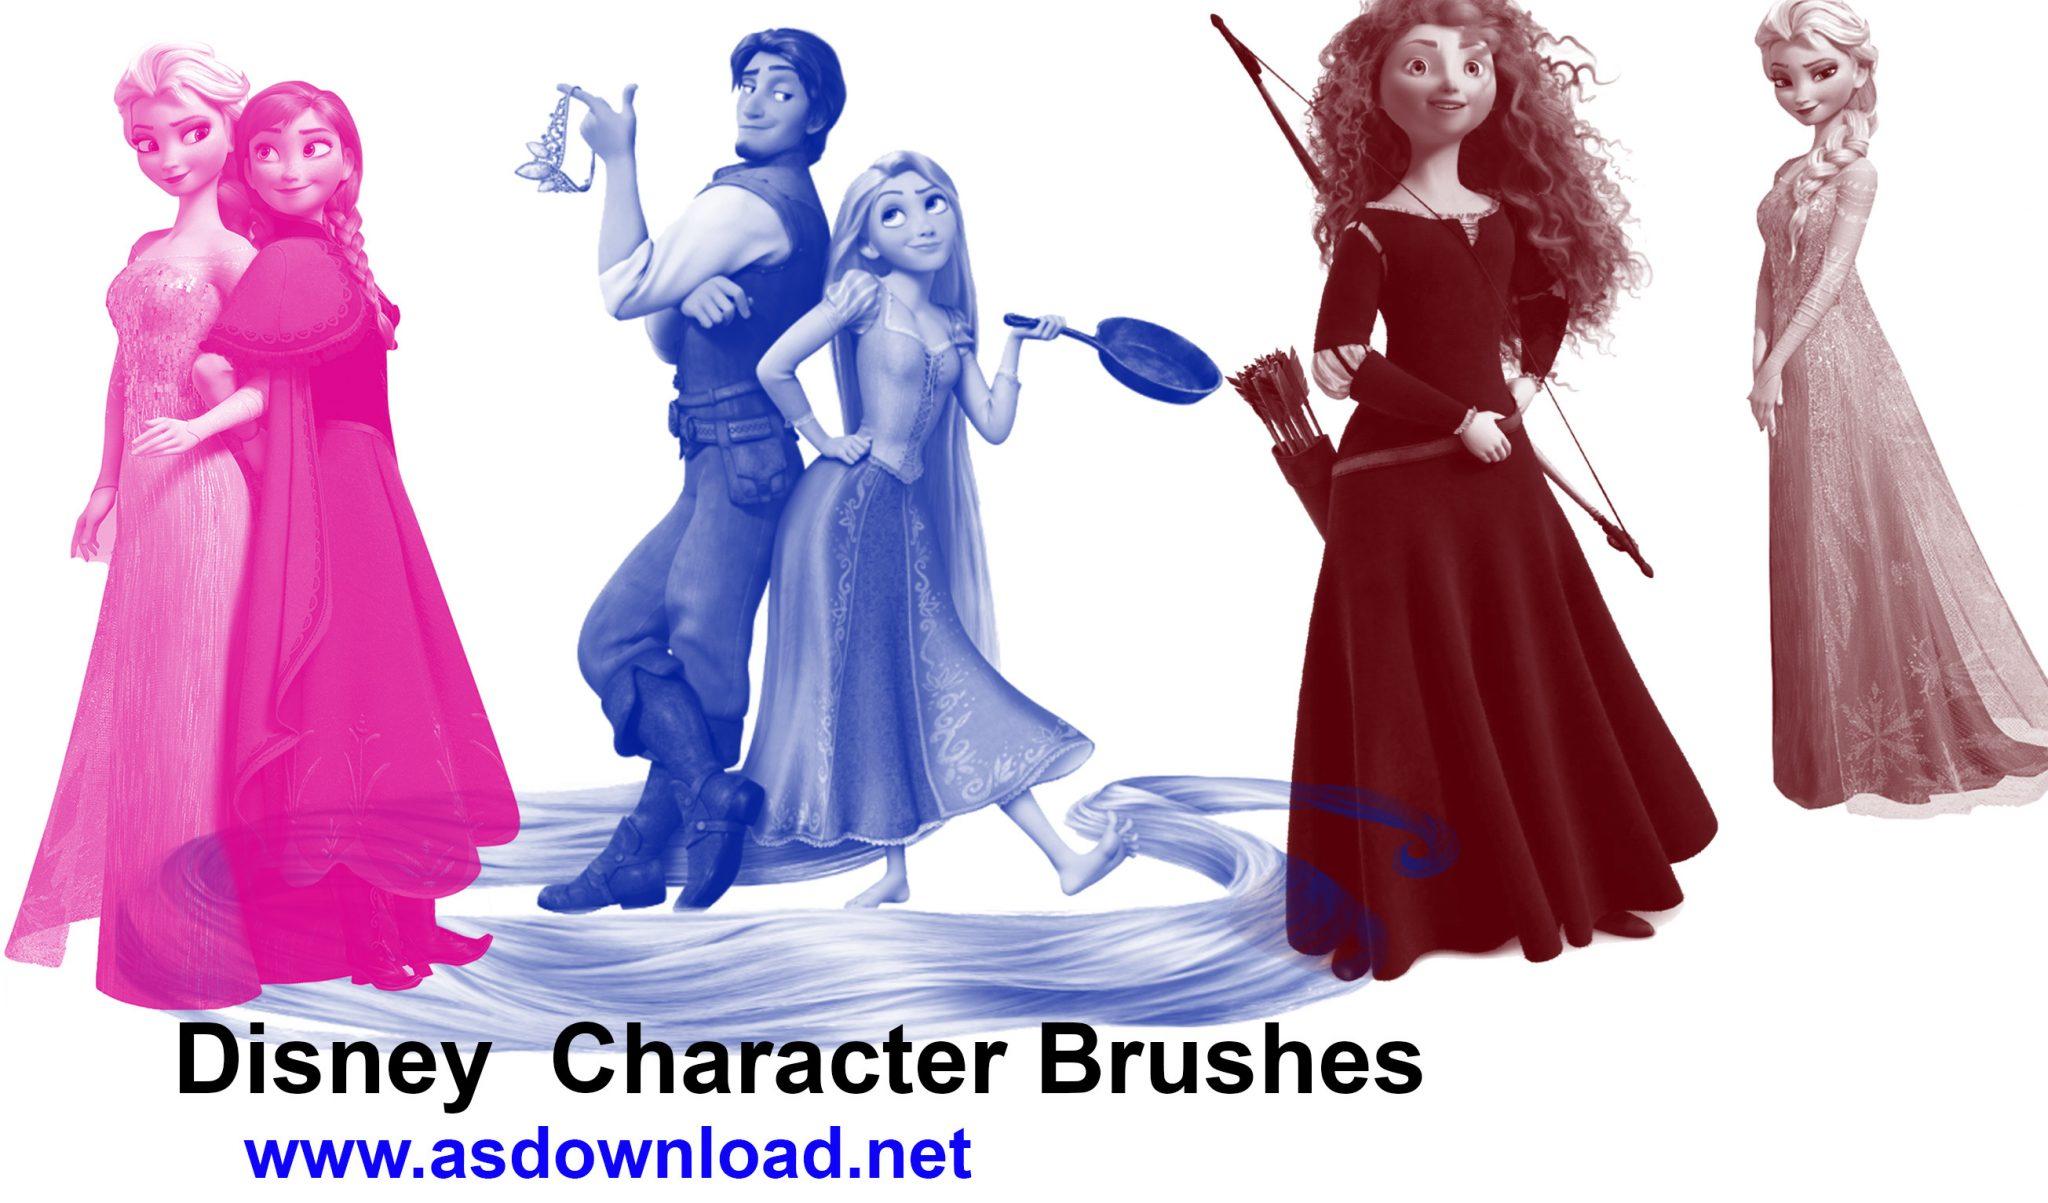 Character Brushes- دانلود قلم مو شخصیت های کارتونی برای فتوشاپ